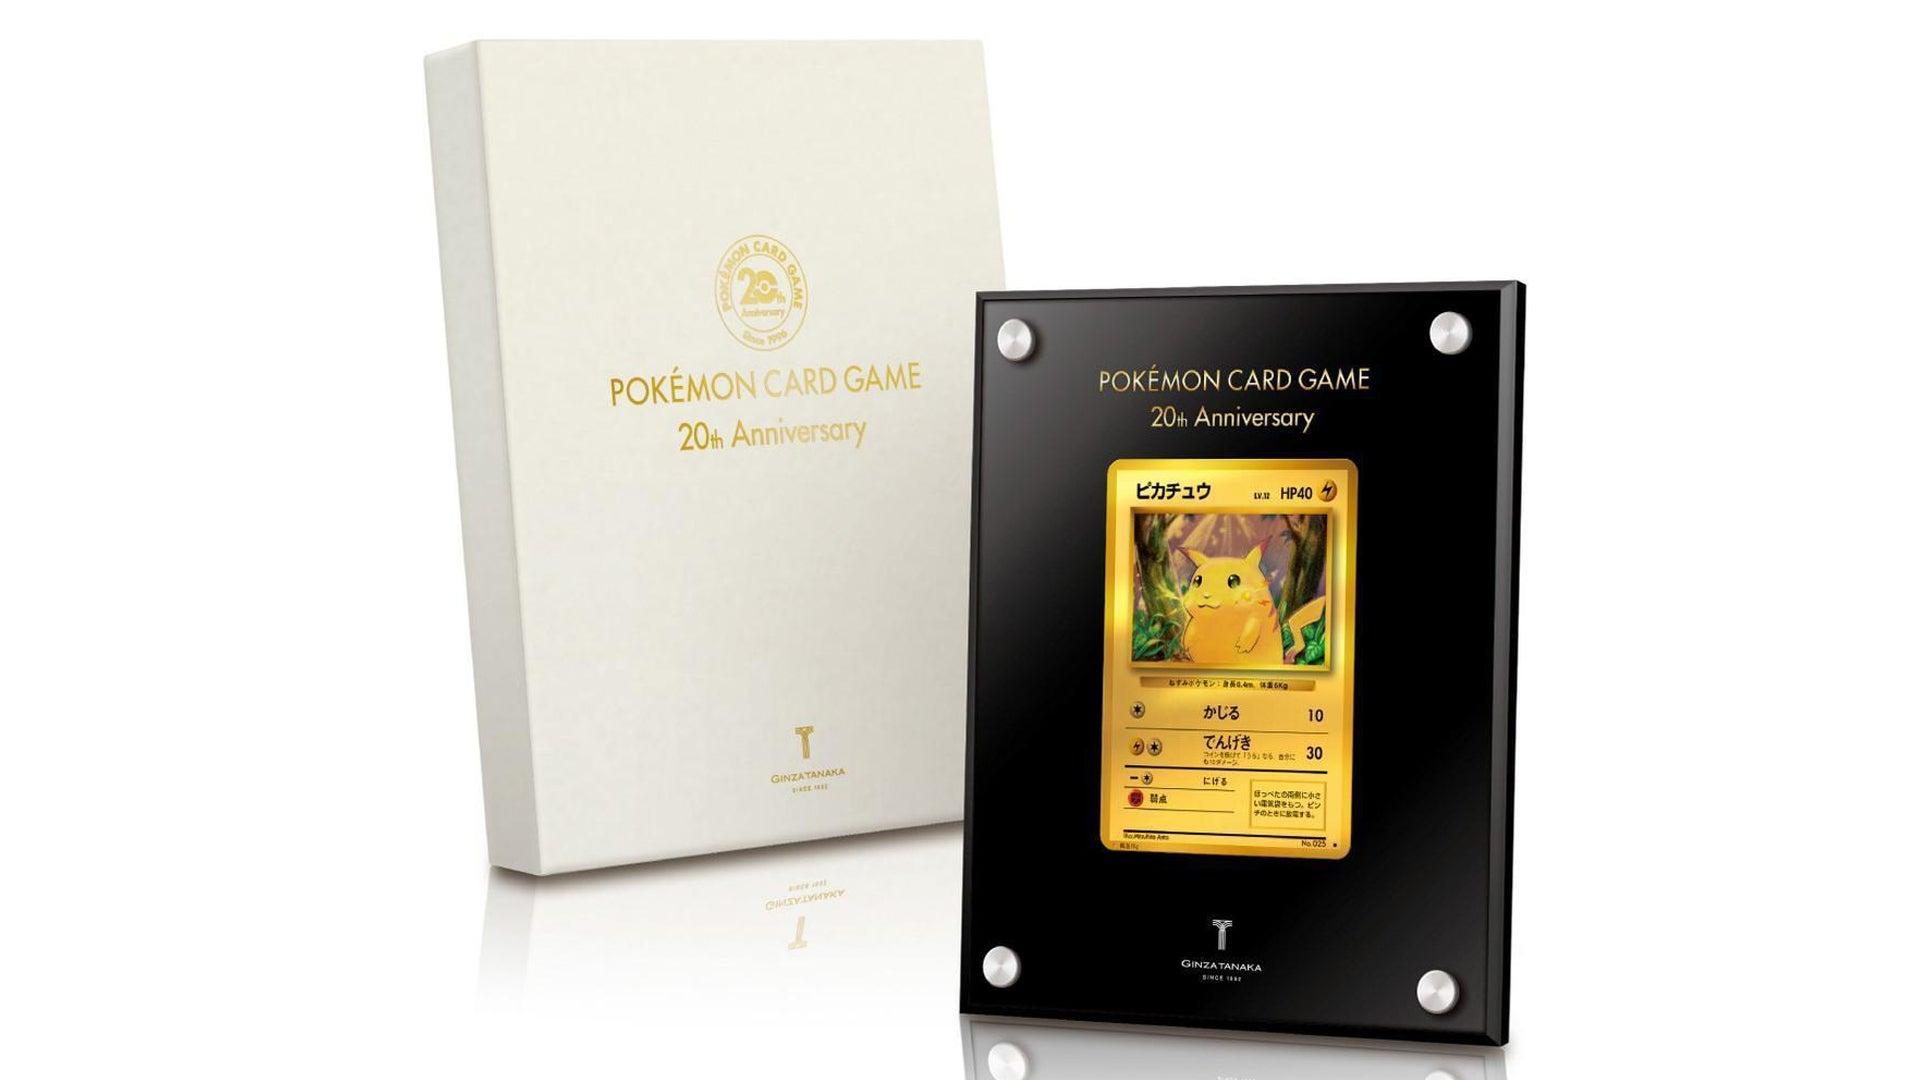 20th Anniversary 24-karat Gold Pikachu Pokémon card